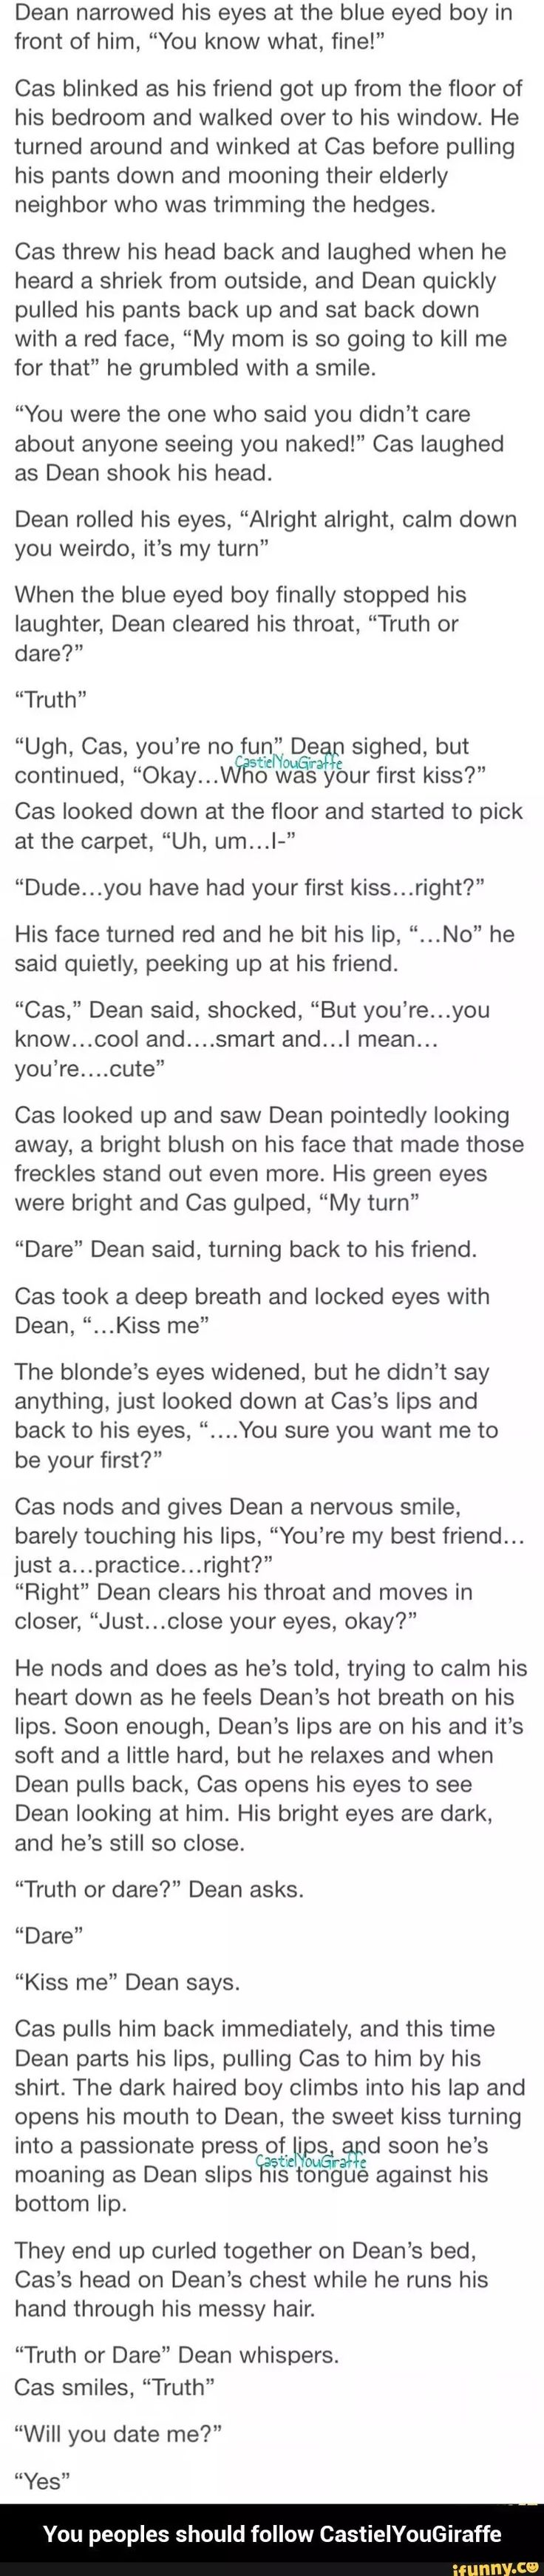 Supernatural Dean Cas